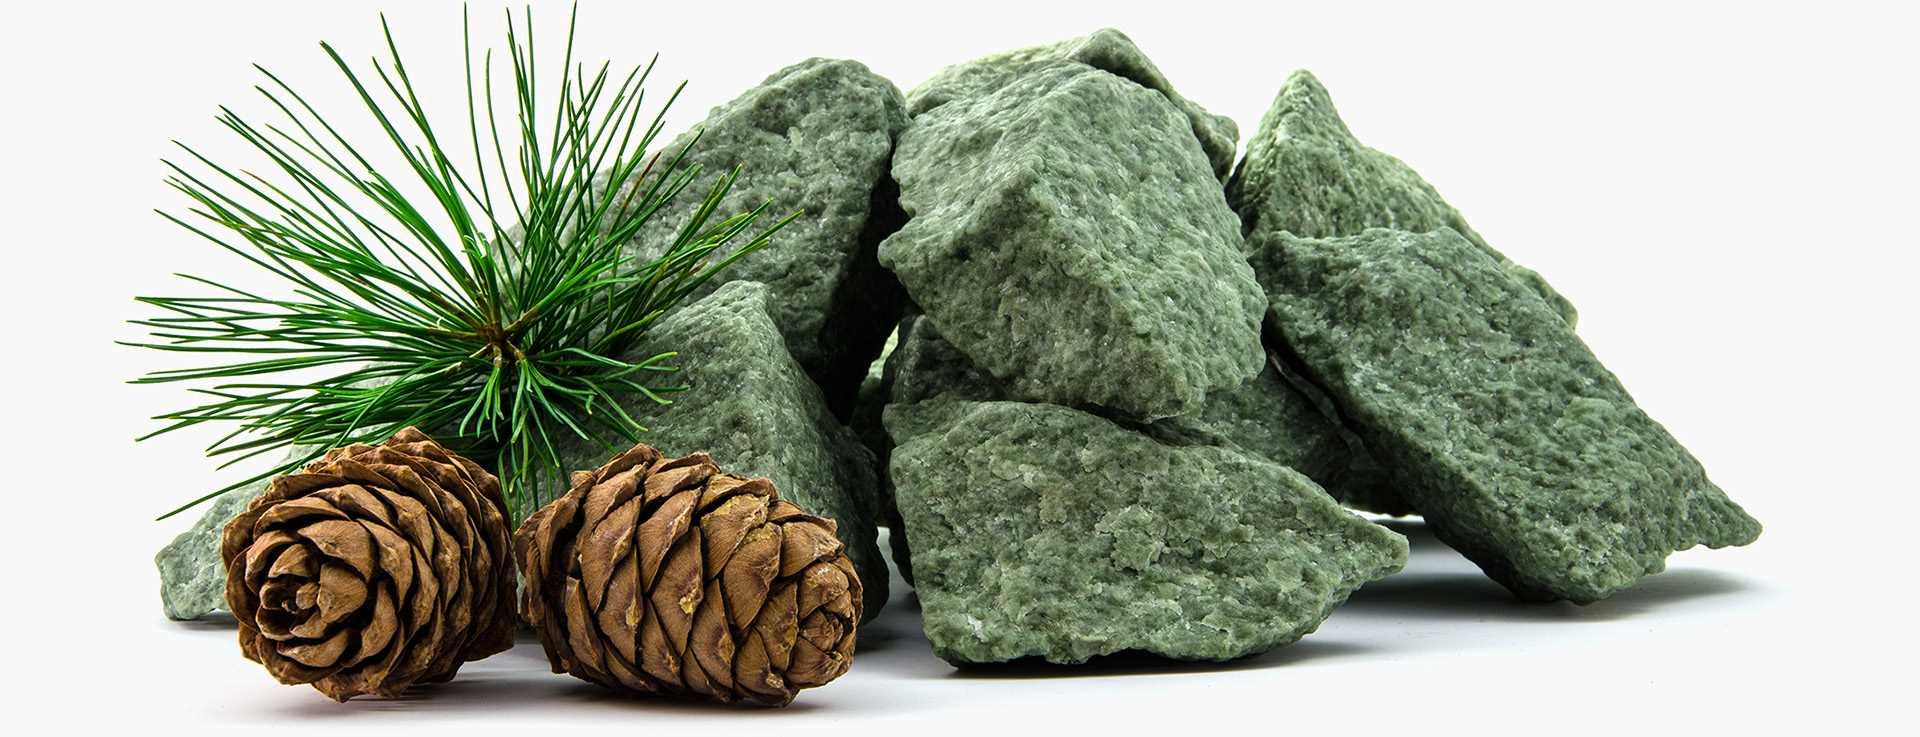 Сибирский жадеит - особый камень для бани!